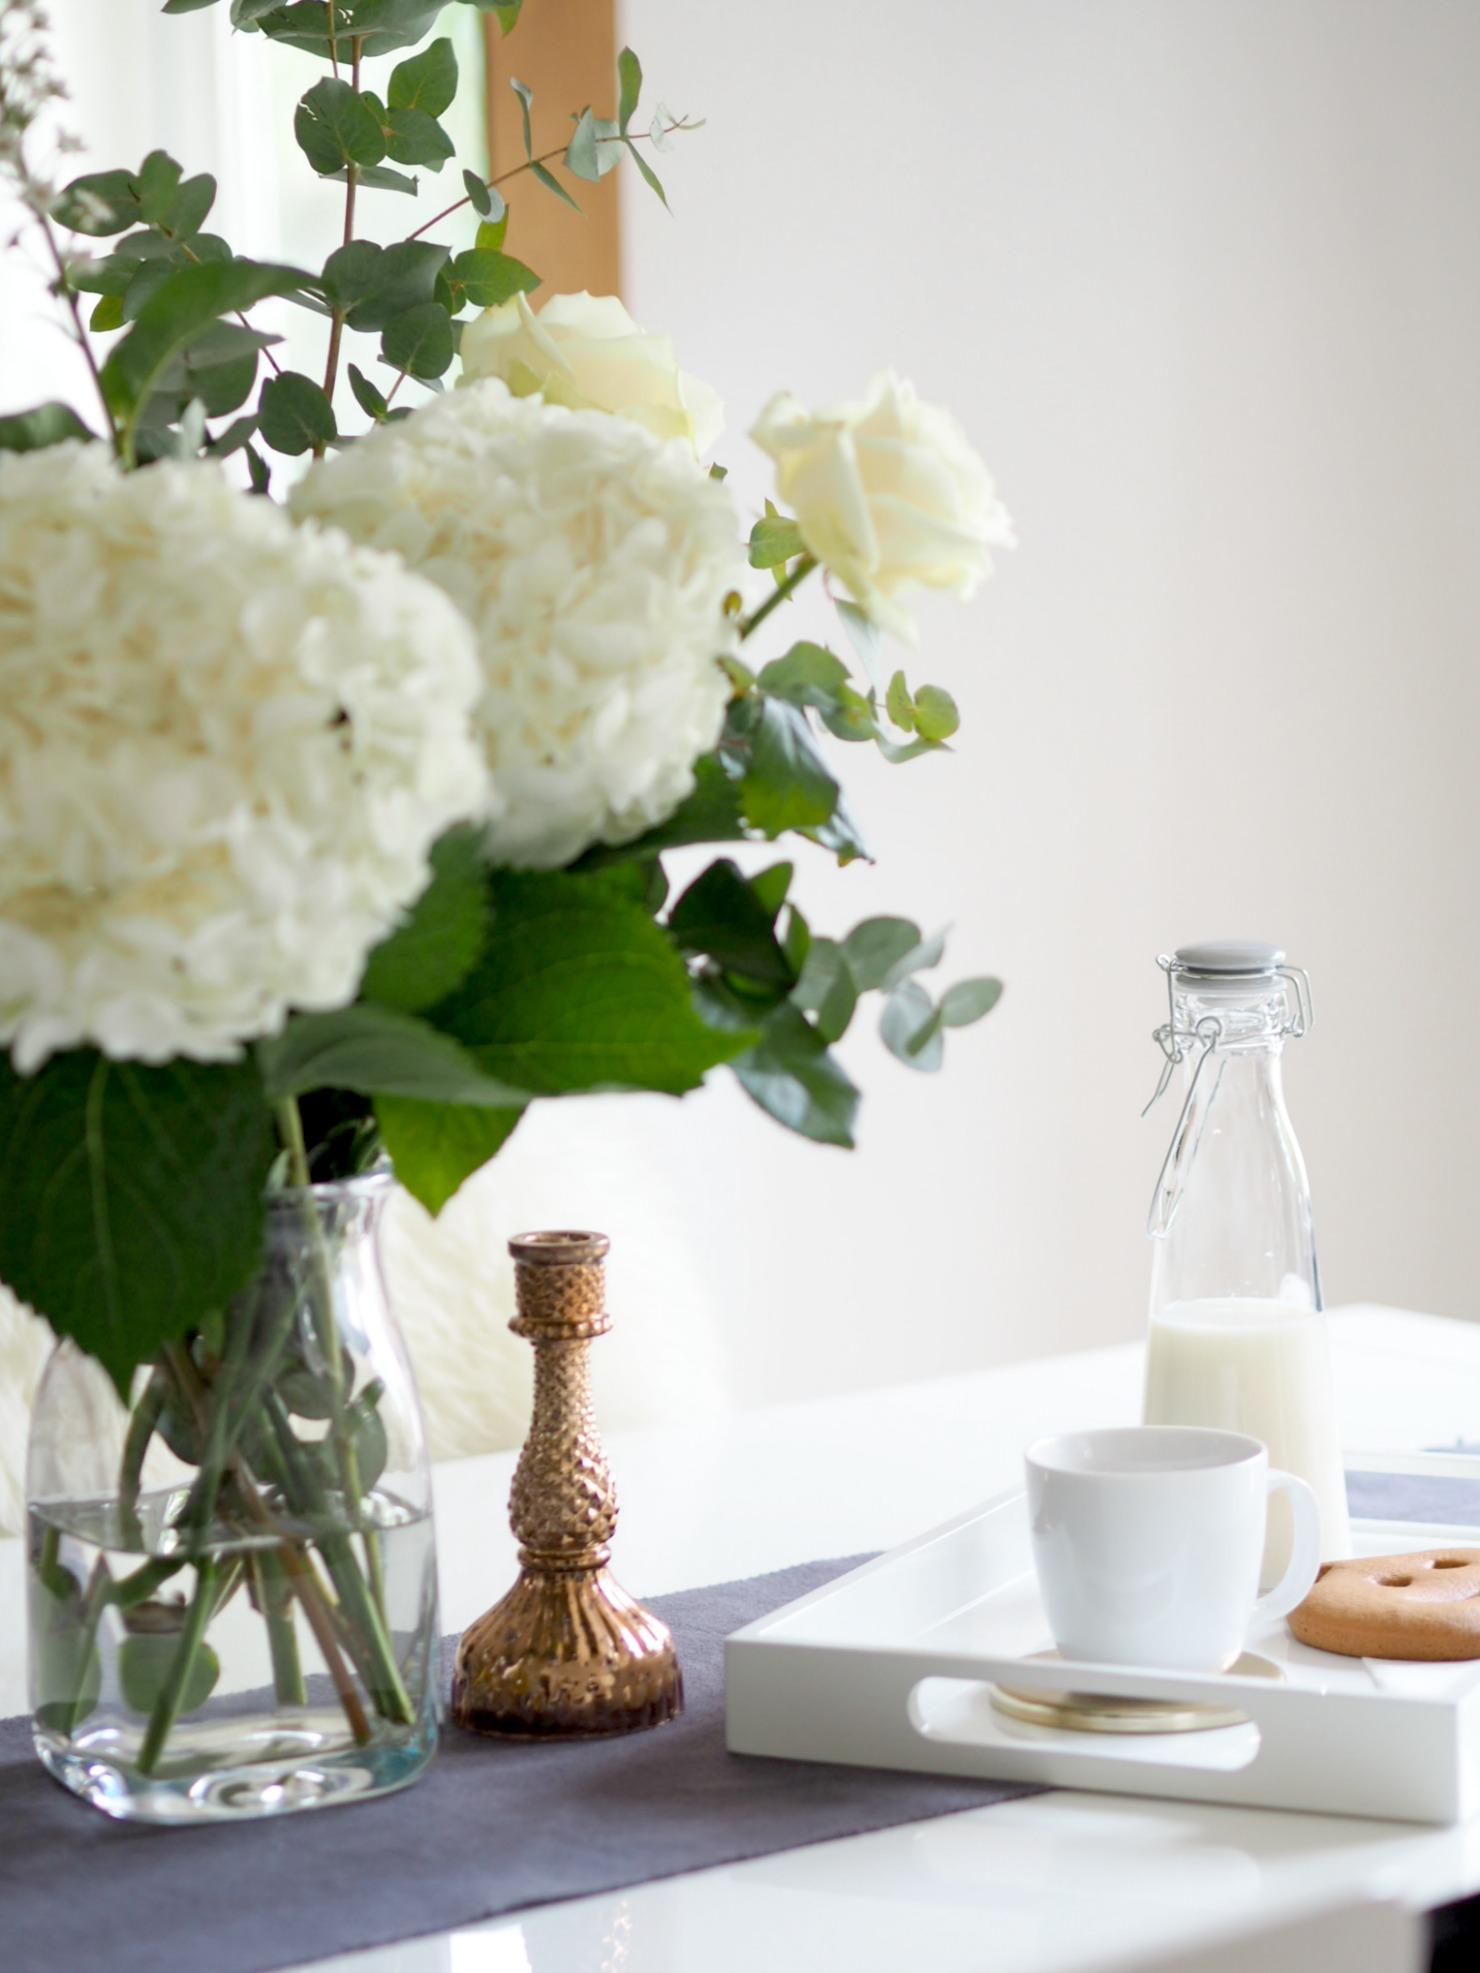 5 coffee and fresh flowers.jpg